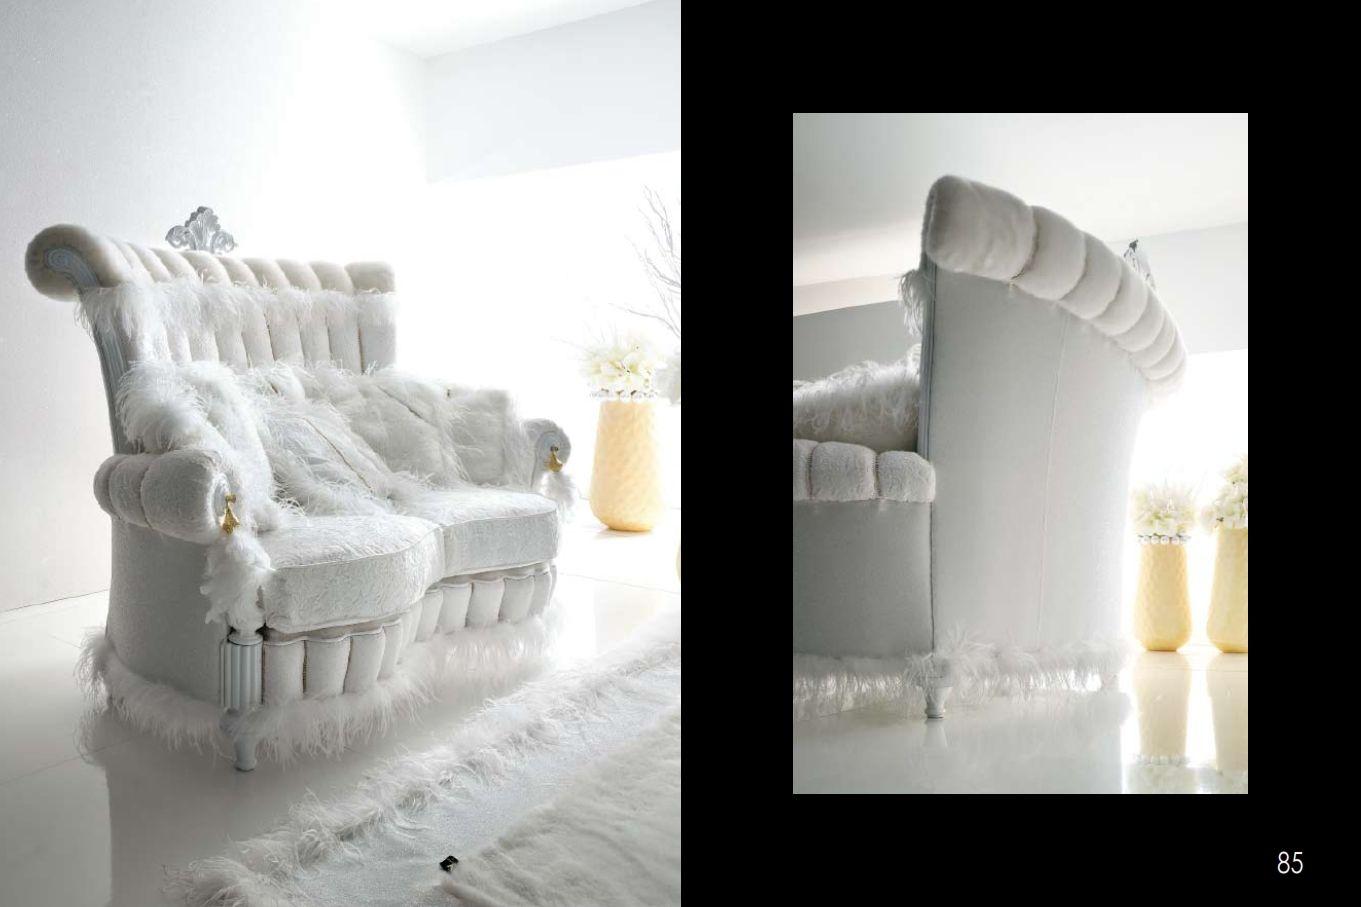 luxus m bel luxuri se sofas alta moda tiffany seriedie m bel aus italien. Black Bedroom Furniture Sets. Home Design Ideas